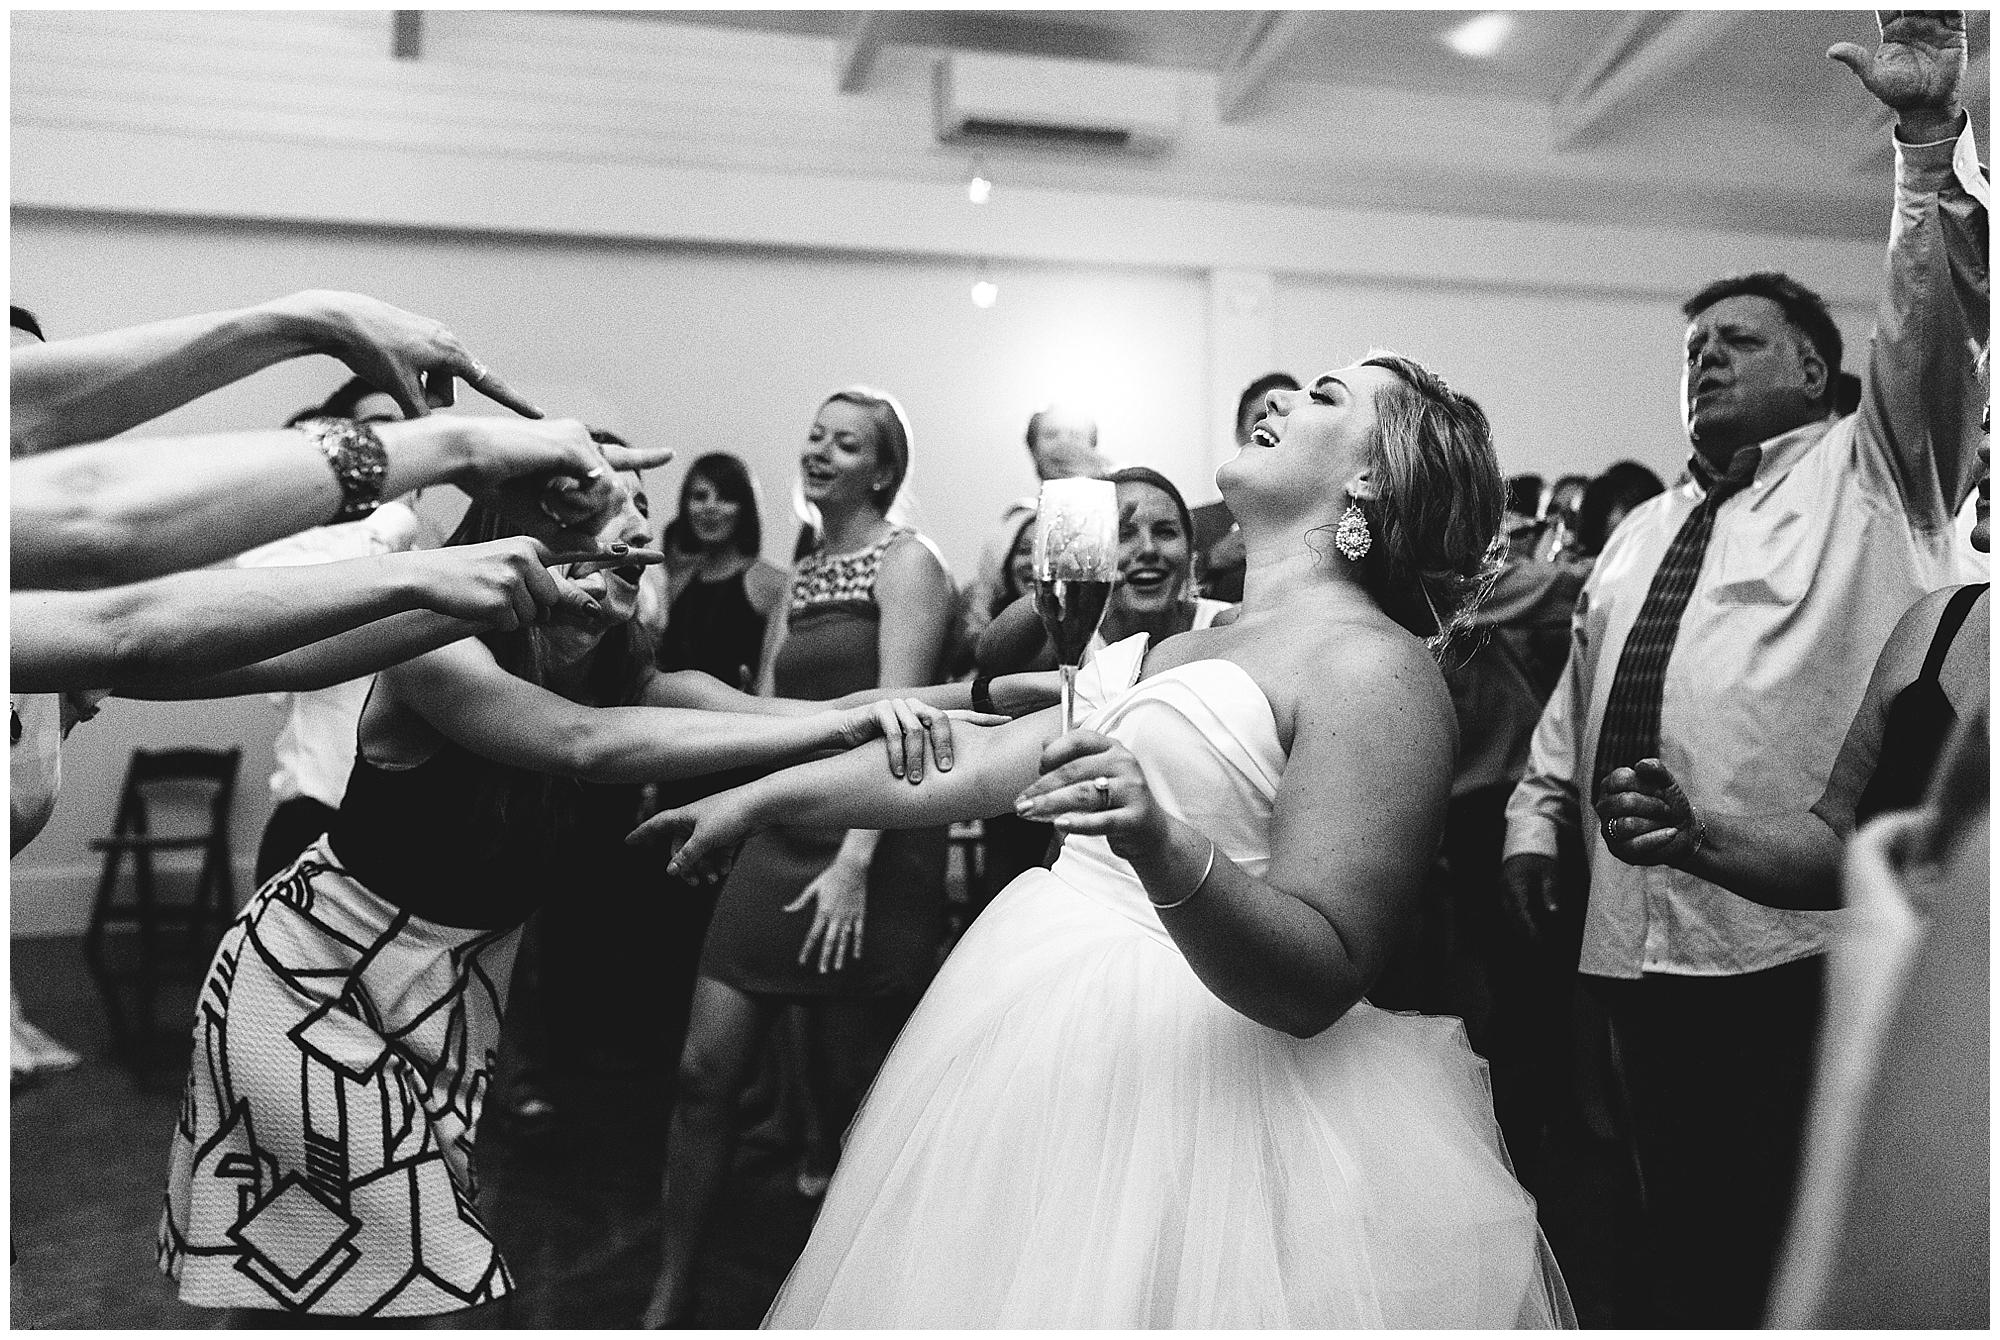 Merrimon-Wynne-Raleigh-Wedding-11.jpg